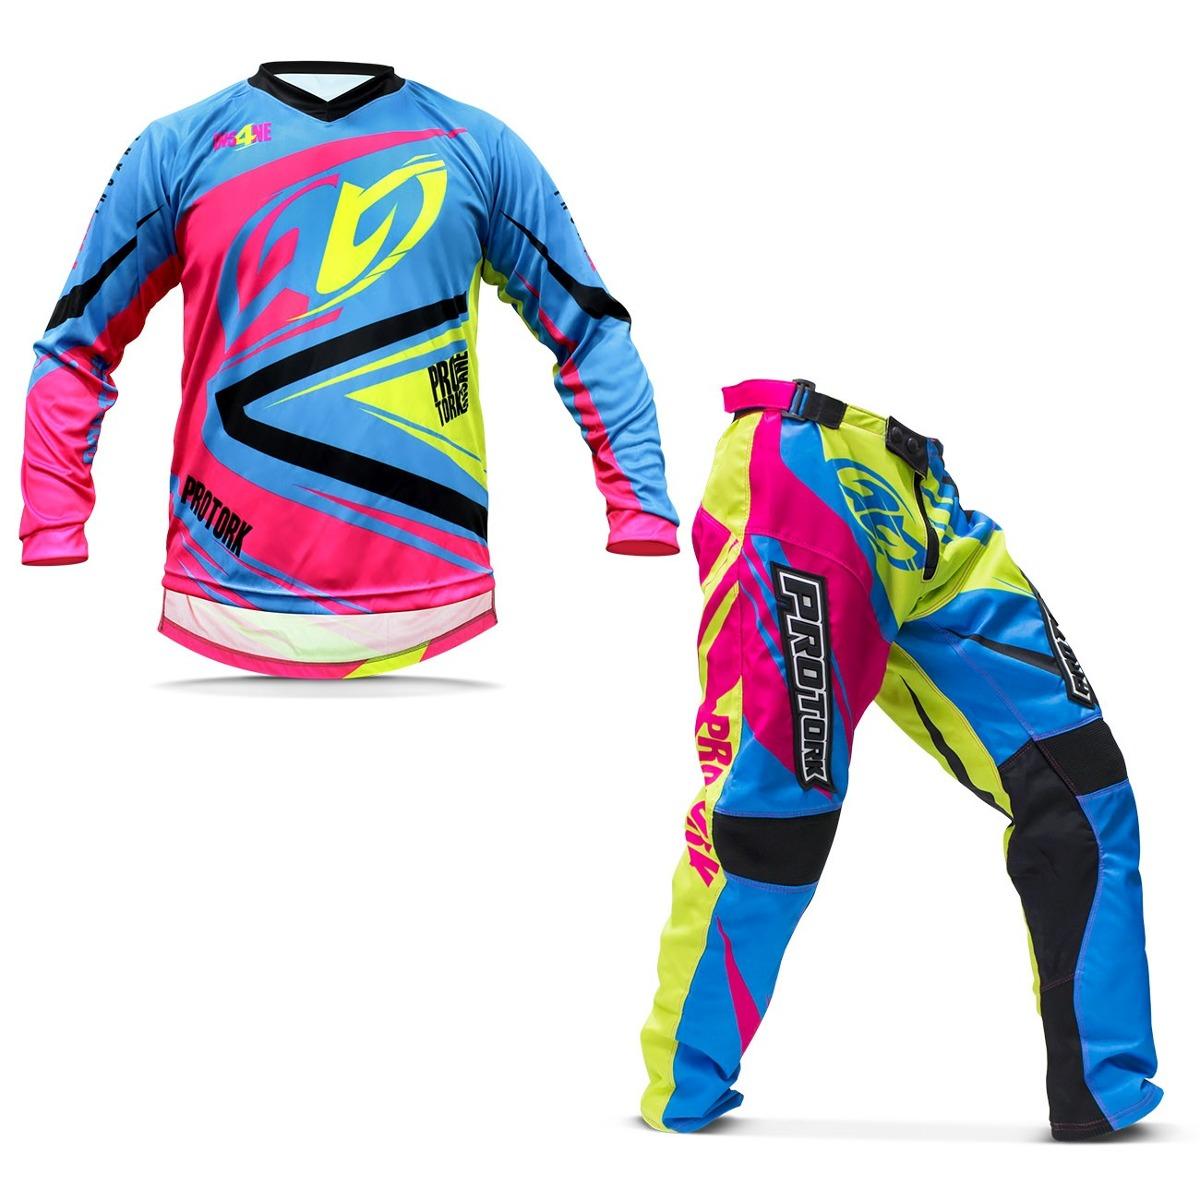 fd777c64f kit roupa motocross pro tork insane 4 calça camisa g trilha. Carregando  zoom.